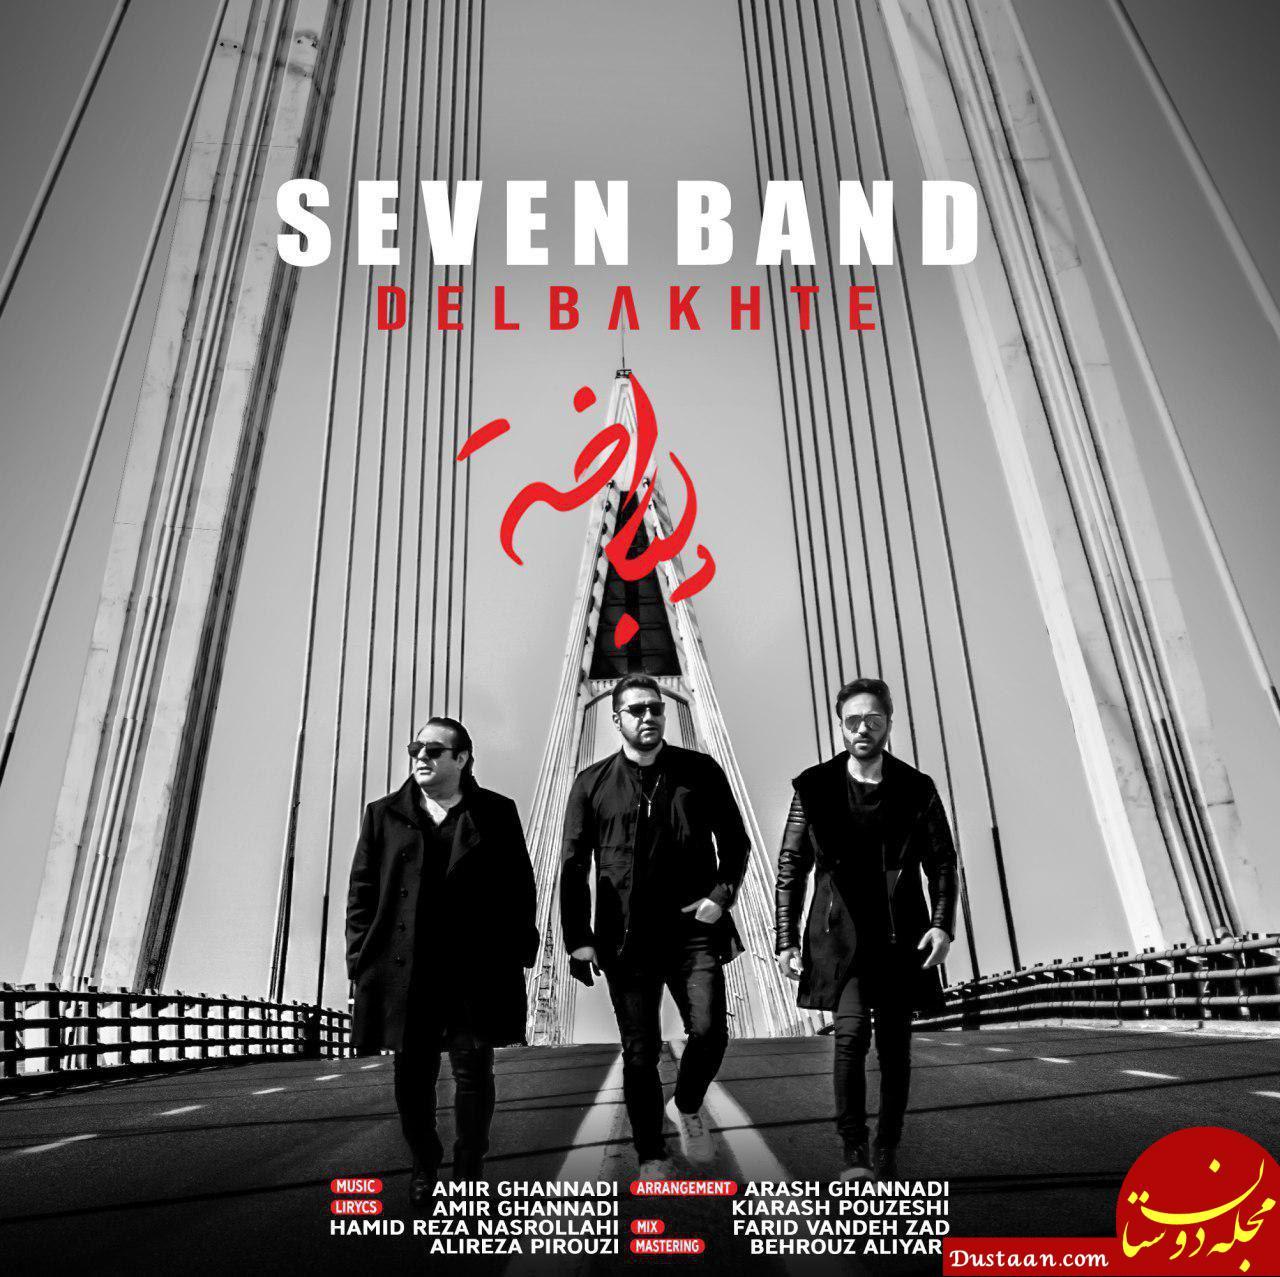 www.dustaan.com دانلود آهنگ جدید سون بند به نام دل باخته با کیفیت بالا